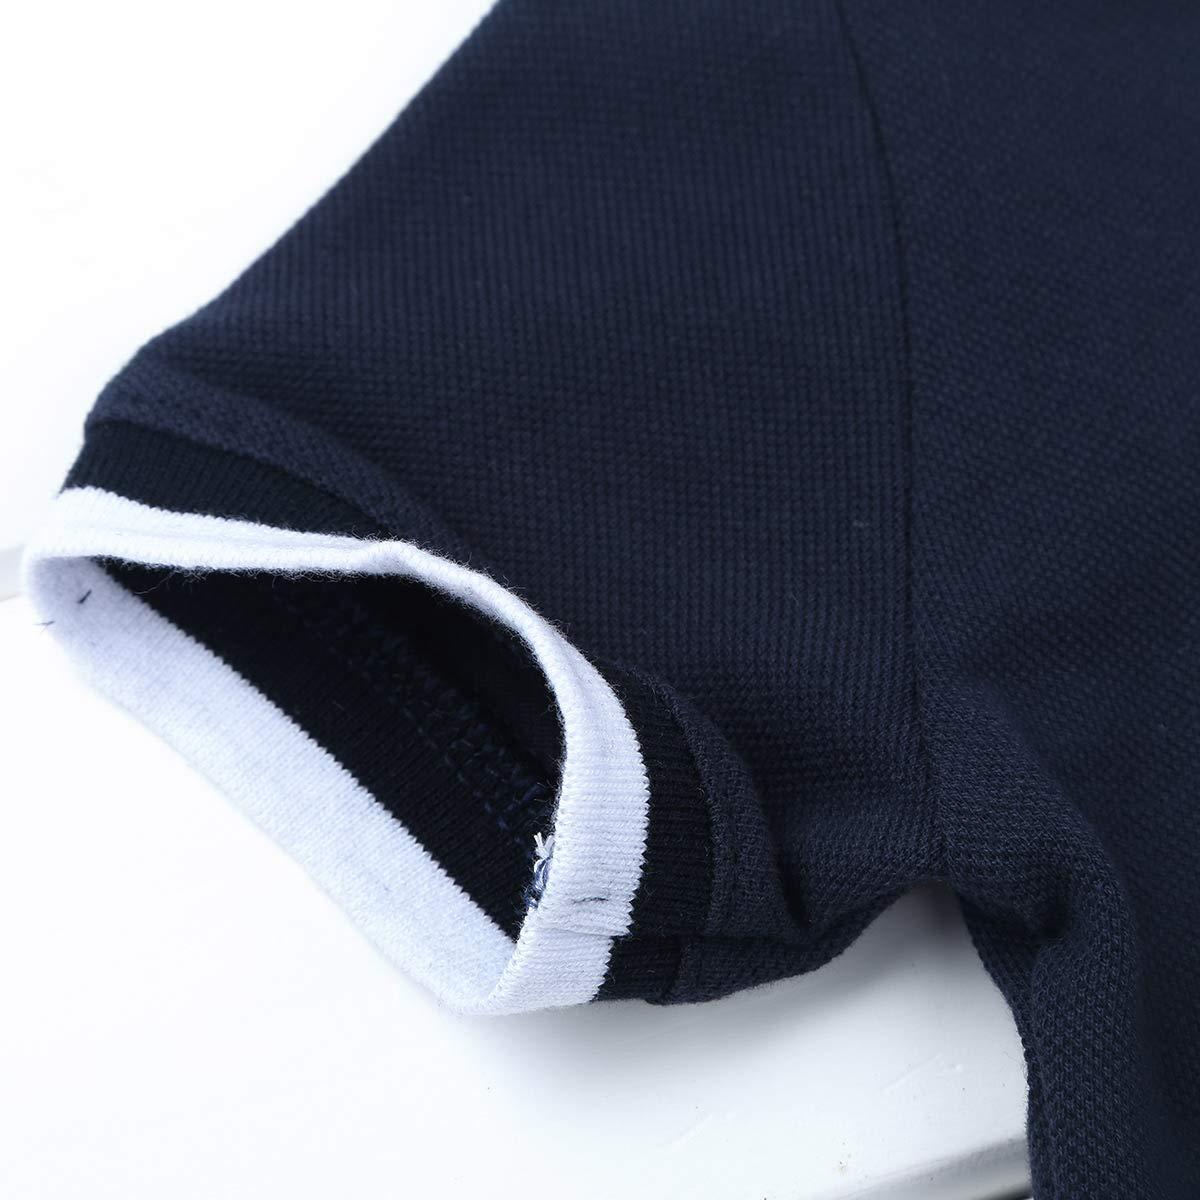 ranrann Camiseta Manga Corta Beb/é Ni/ño Bodis Verano Mameluco de Algod/ón Camisa Reci/én Nacido para Bautizo Fiesta Cumplea/ños Bodysuit Ni/ño 6-24 Meses